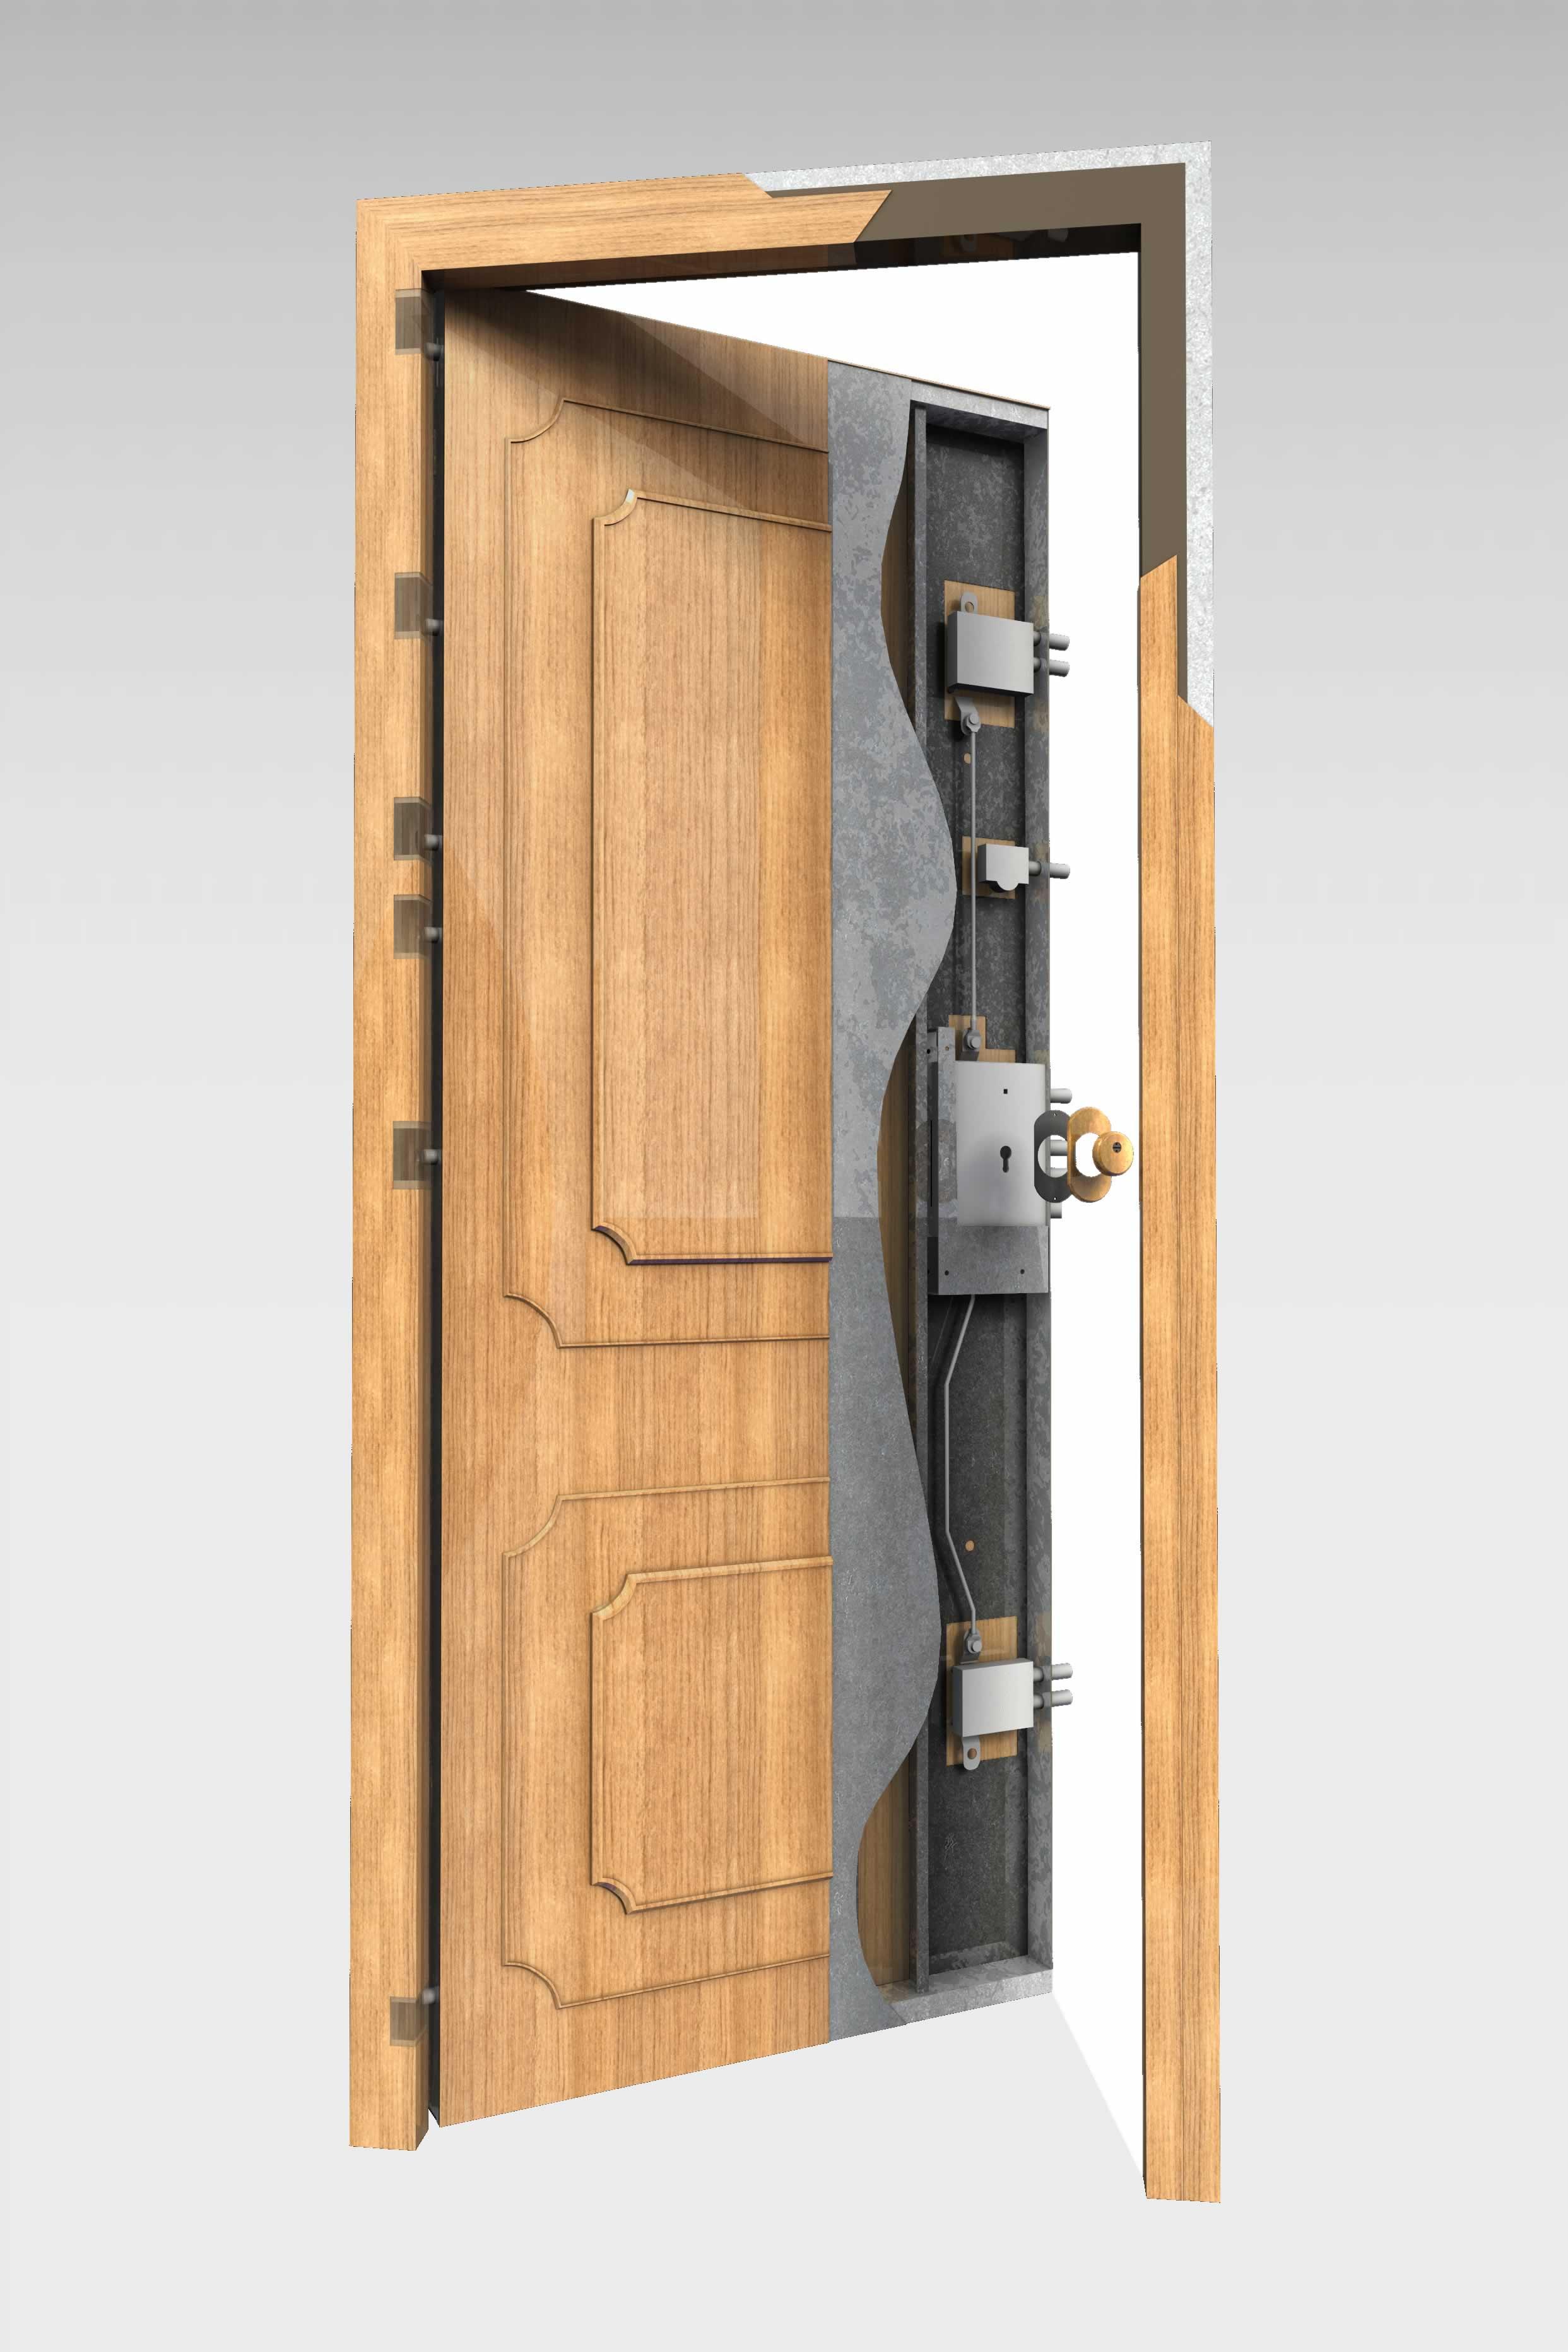 Puerta acorazada 200 ei2 60mn roconsa - Puertas blindadas a medida ...